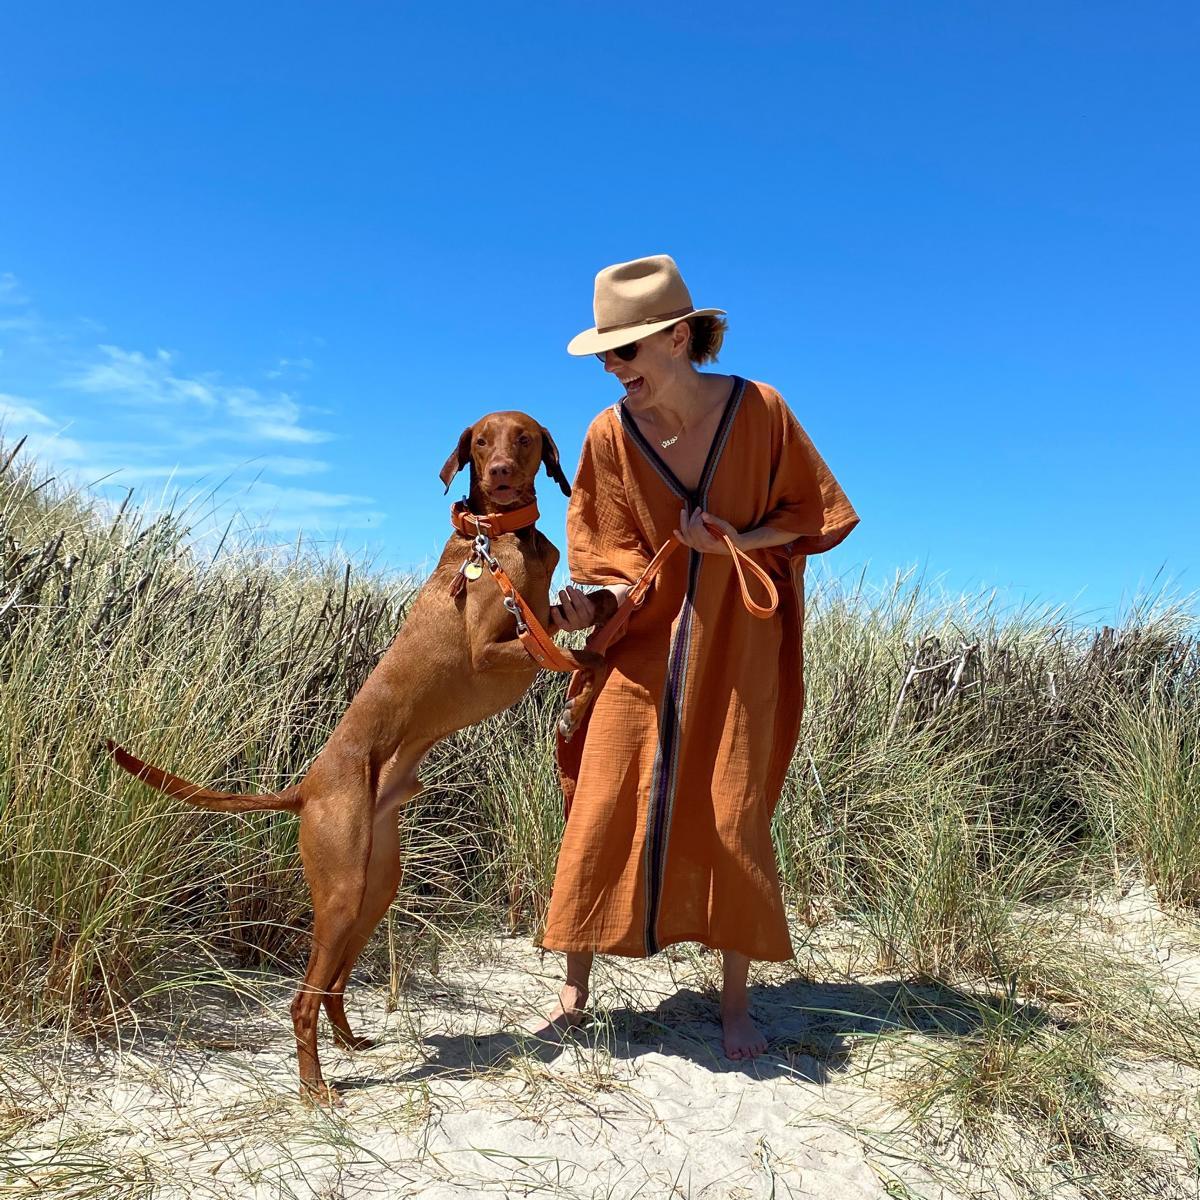 style hannover beachrebelle 3 - Stadtteil-test